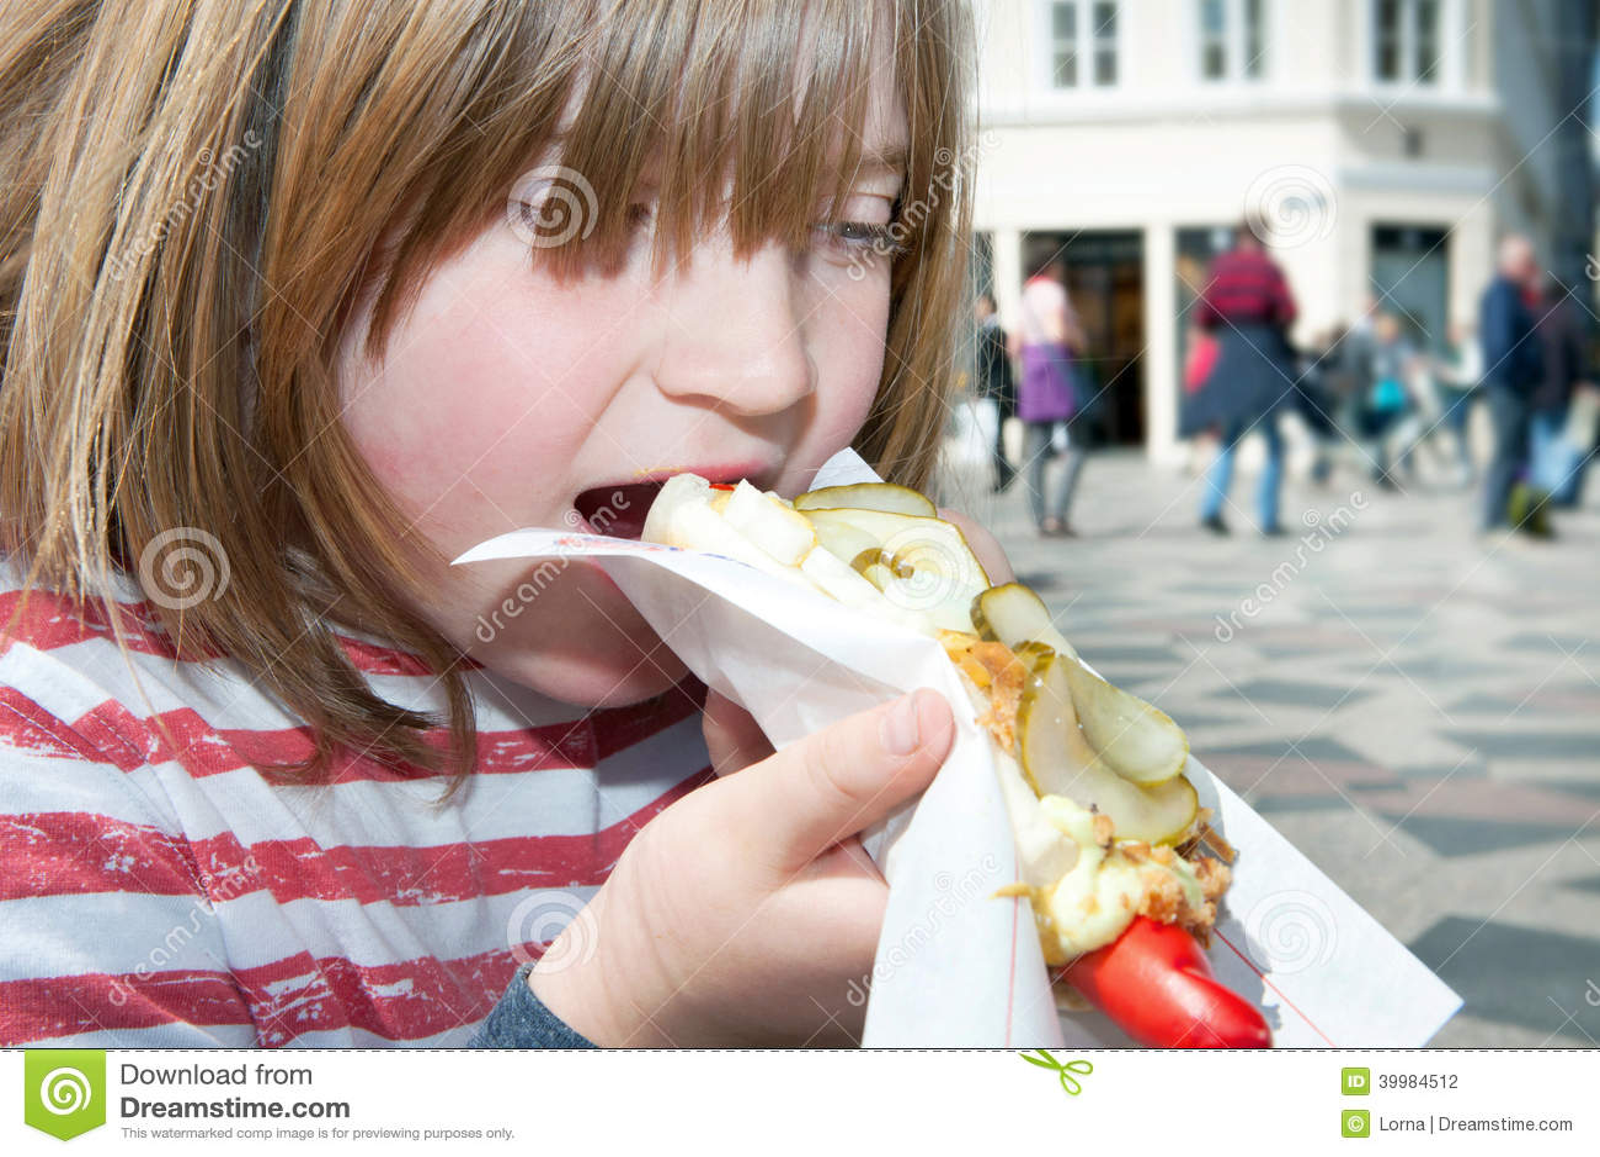 Danish cuny eating